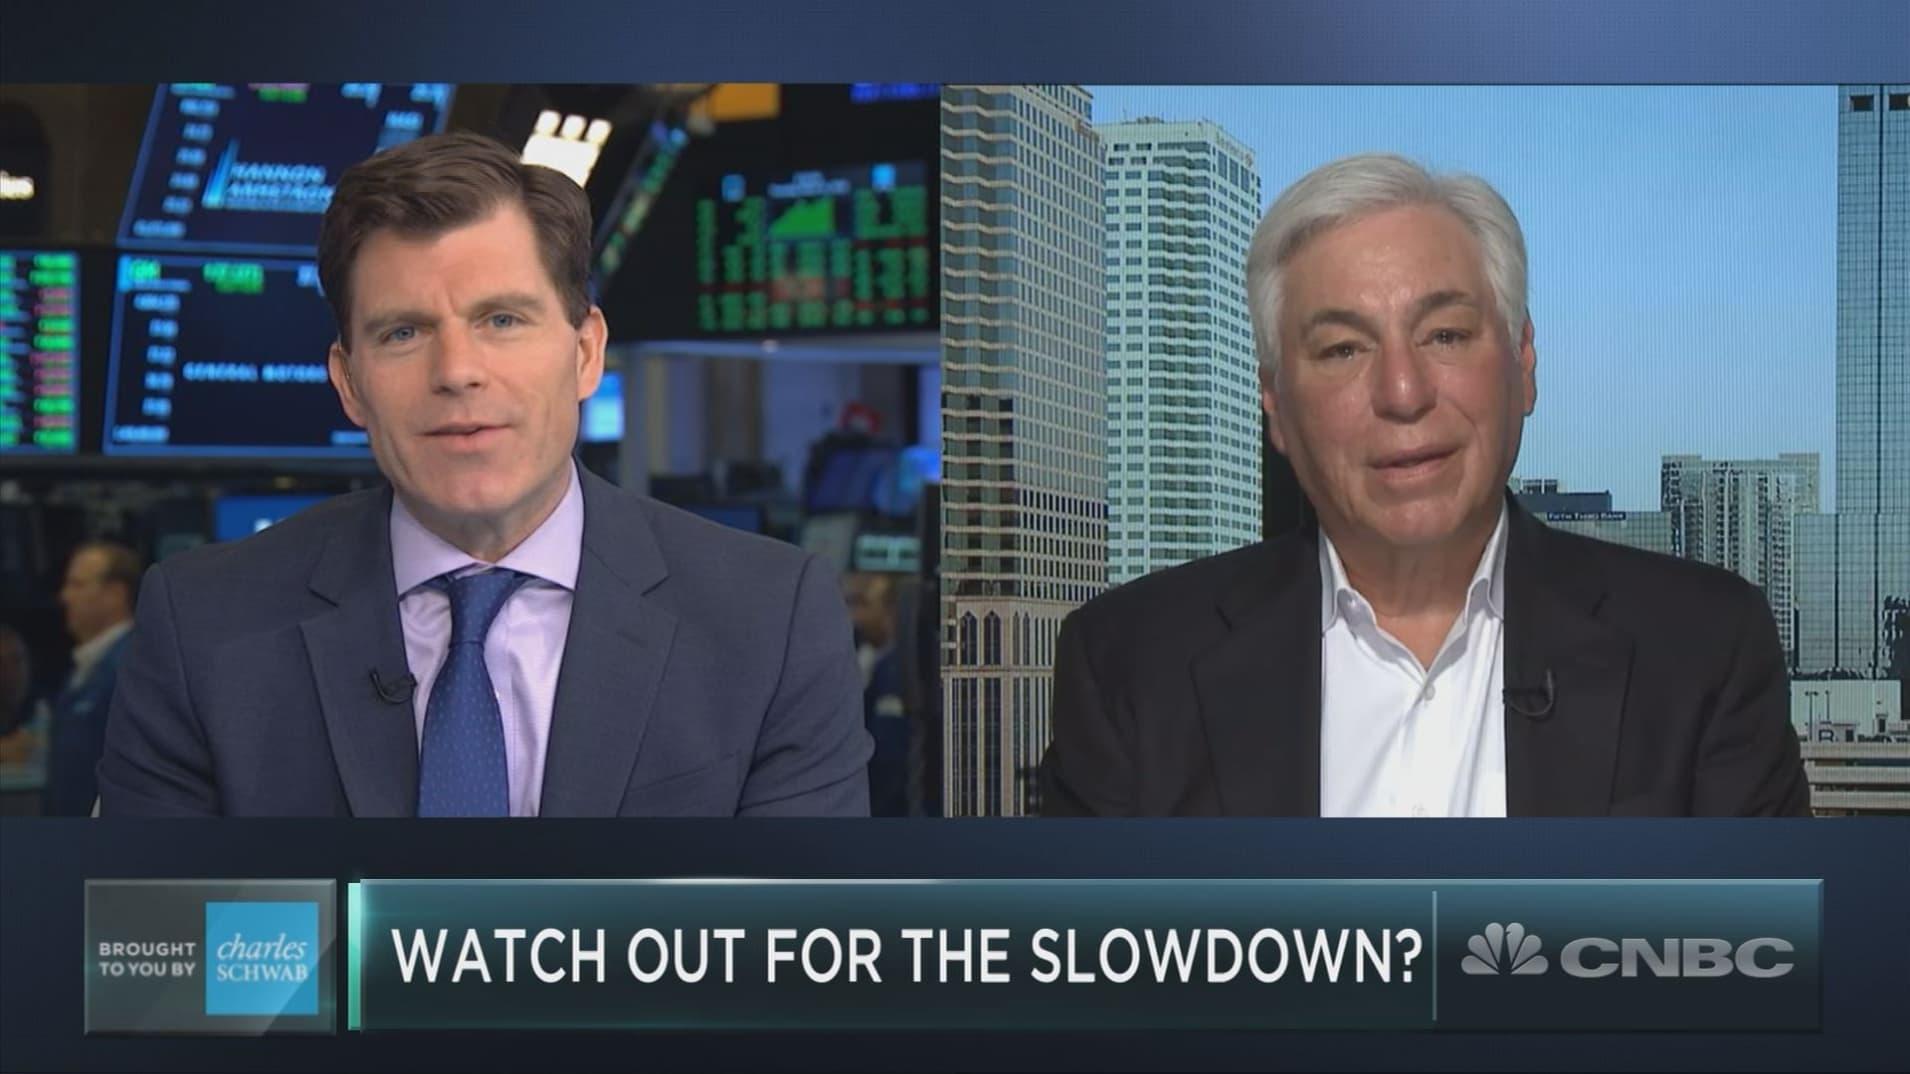 Three stocks to hedge against an economic slowdown